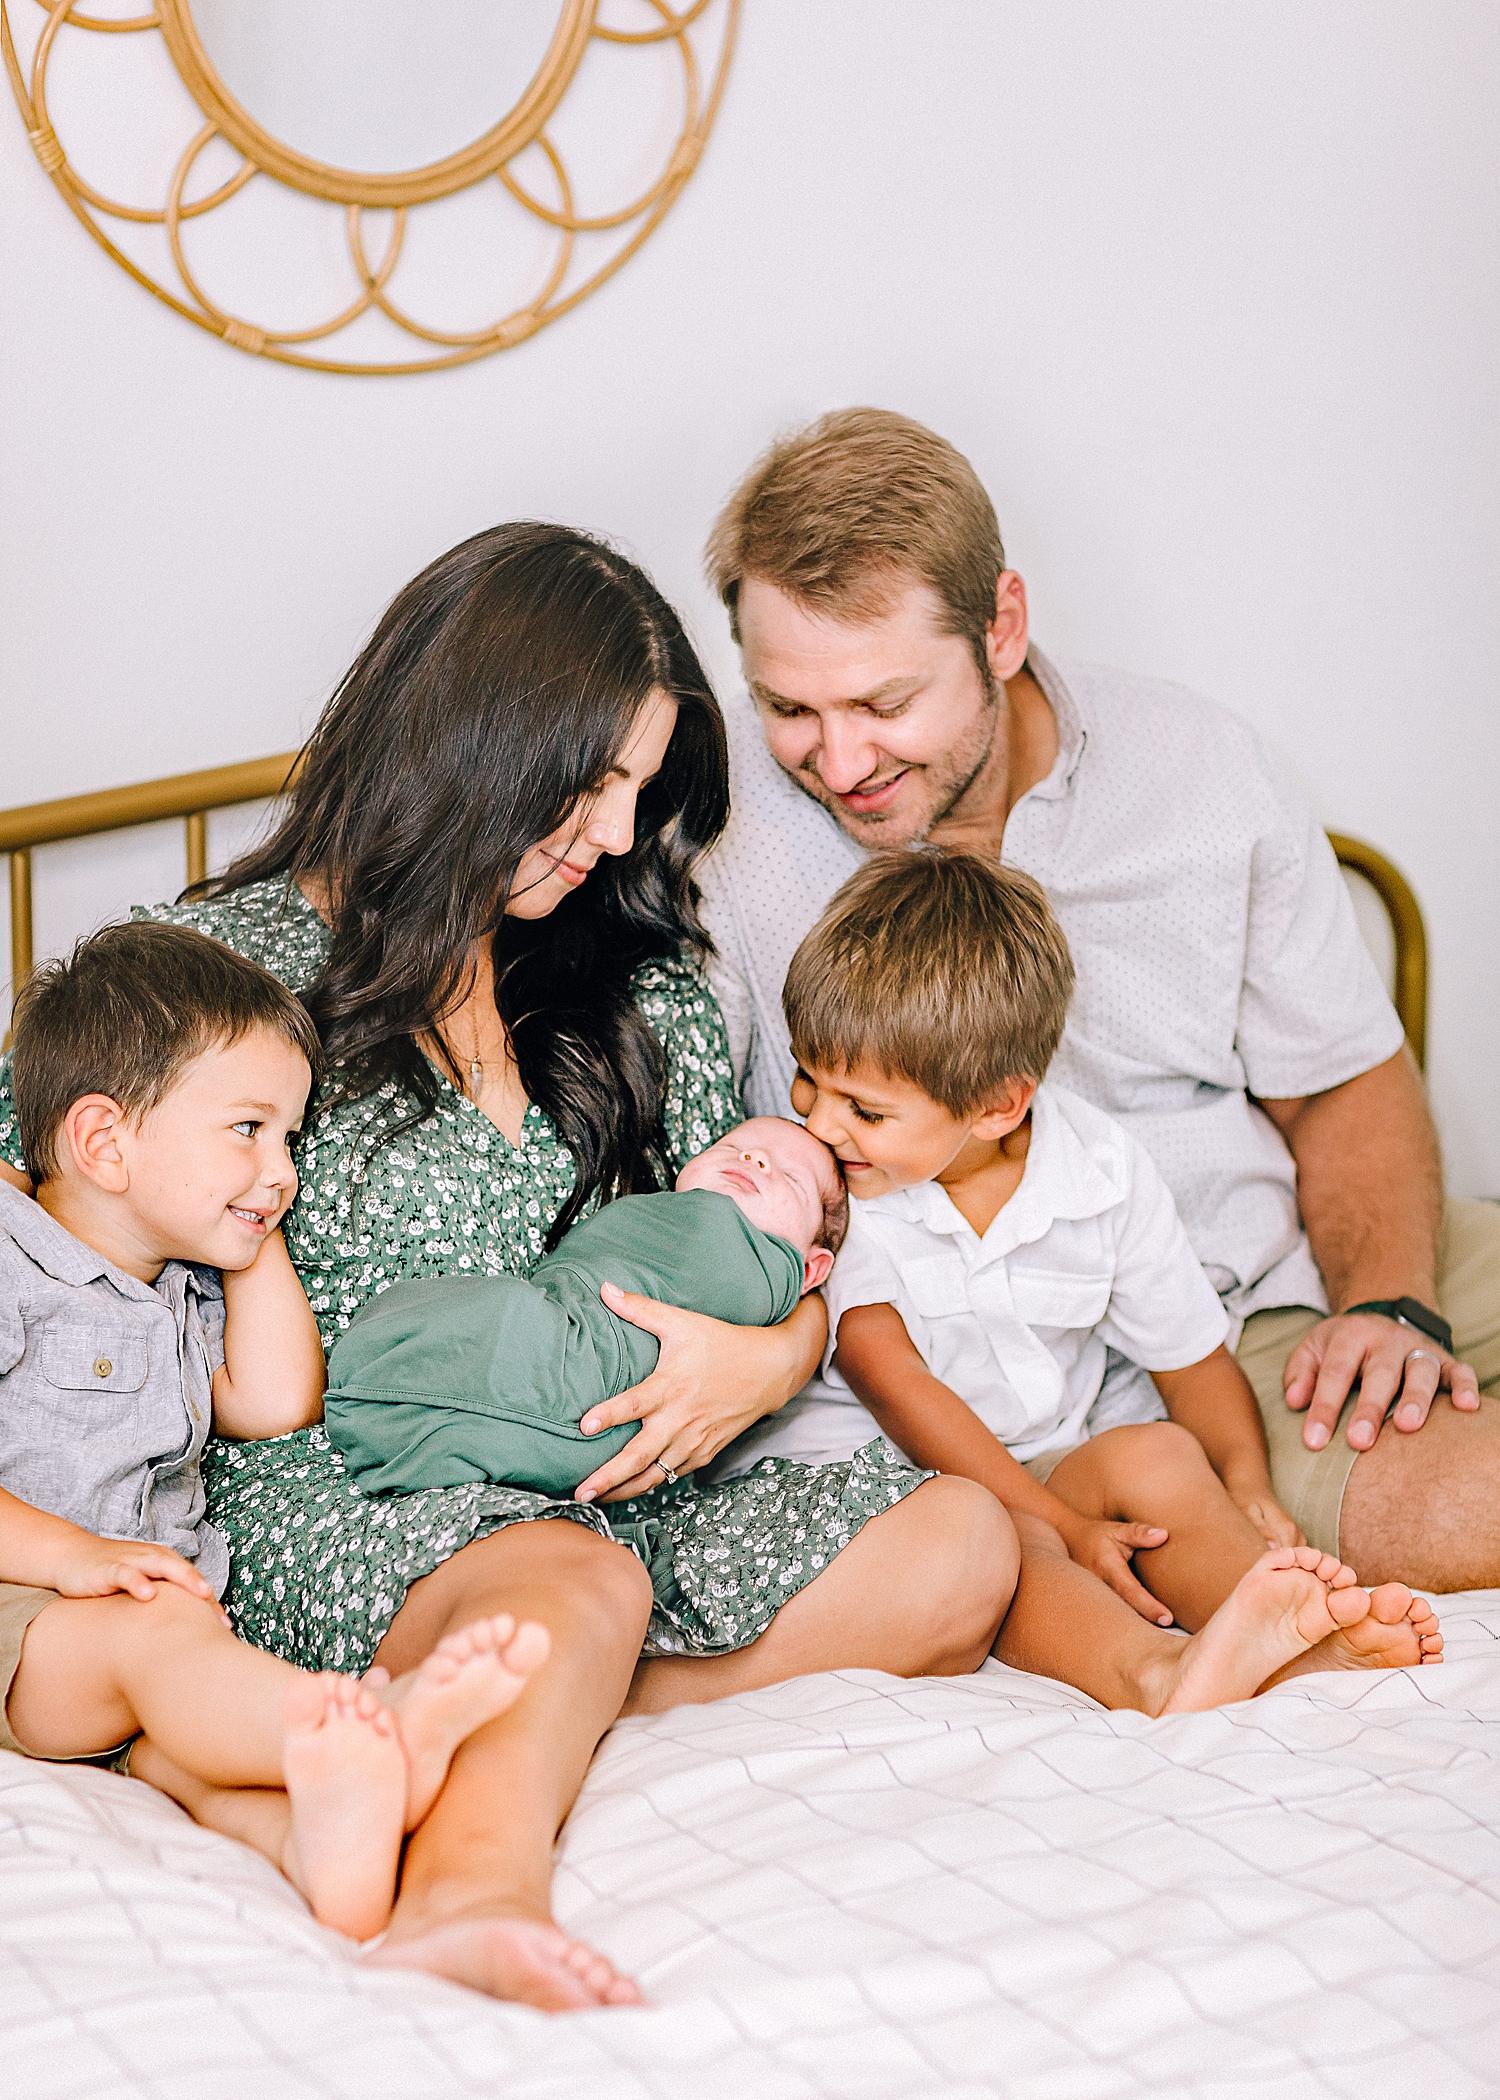 Carly-Barton-Photography-Lifestyle-Newborn-Photographer-Brothers-Family-Photos-Texas_0019.jpg